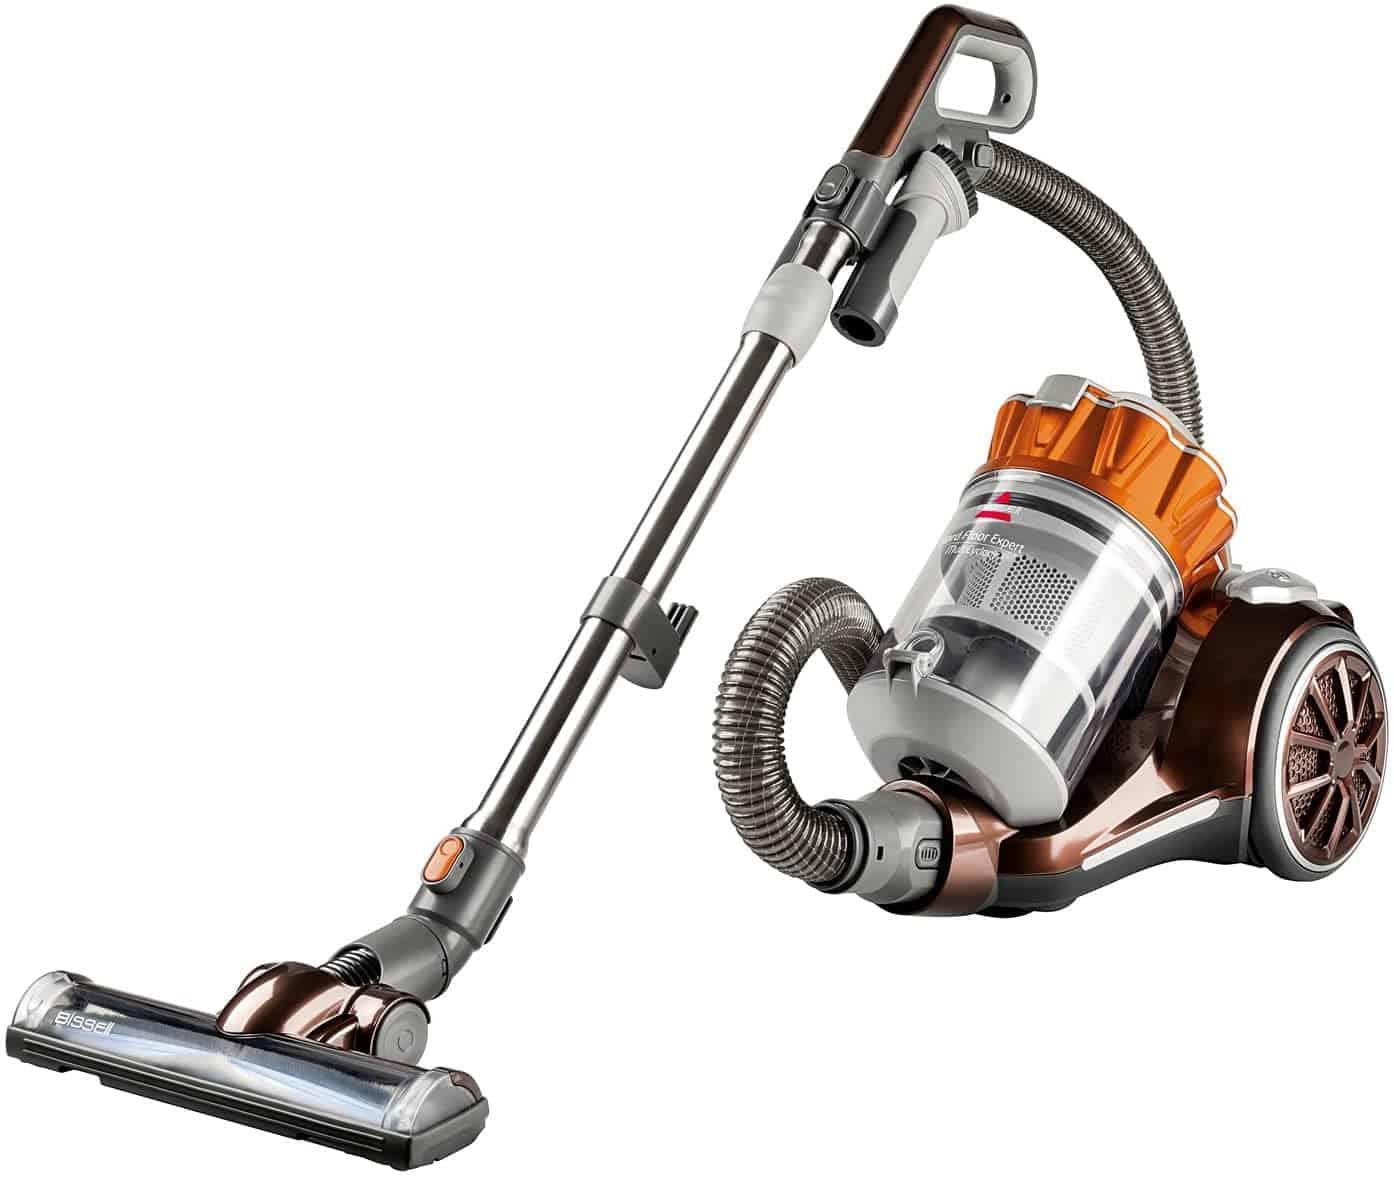 Bissell hard floor expert multi cyclonic vacuum